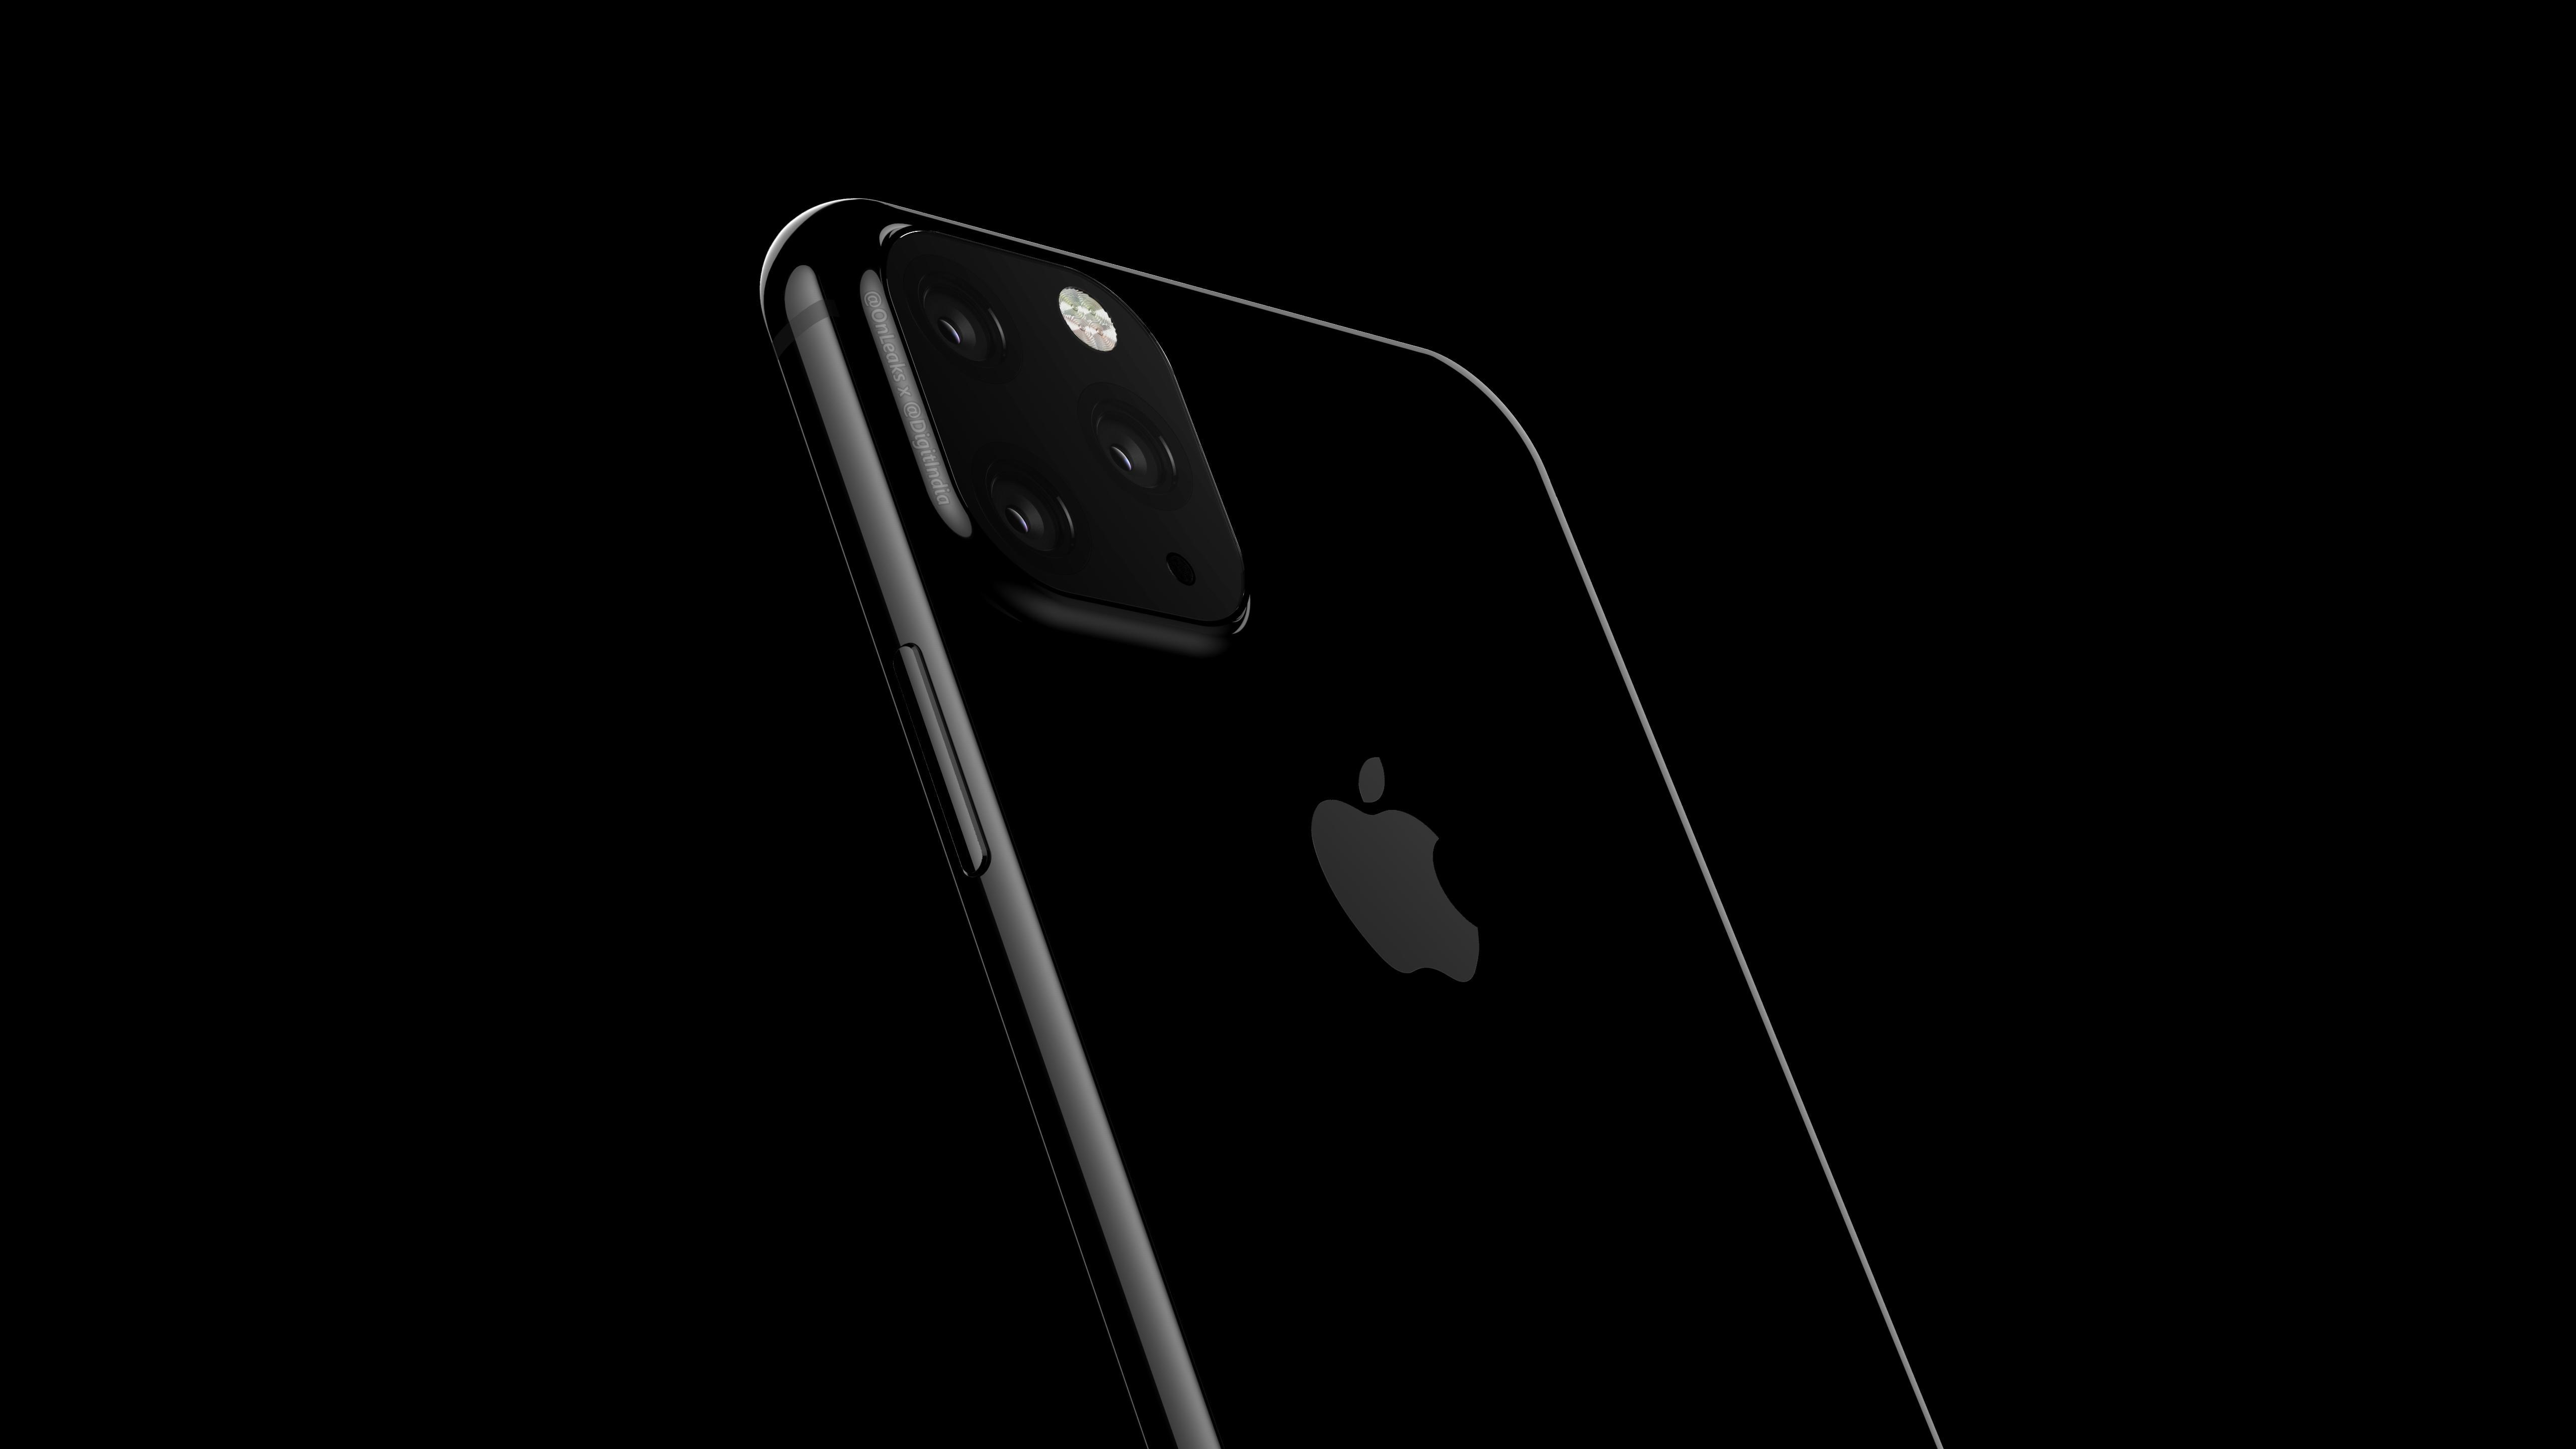 Apple bringt im Herbst elf neue iPhone-Modelle